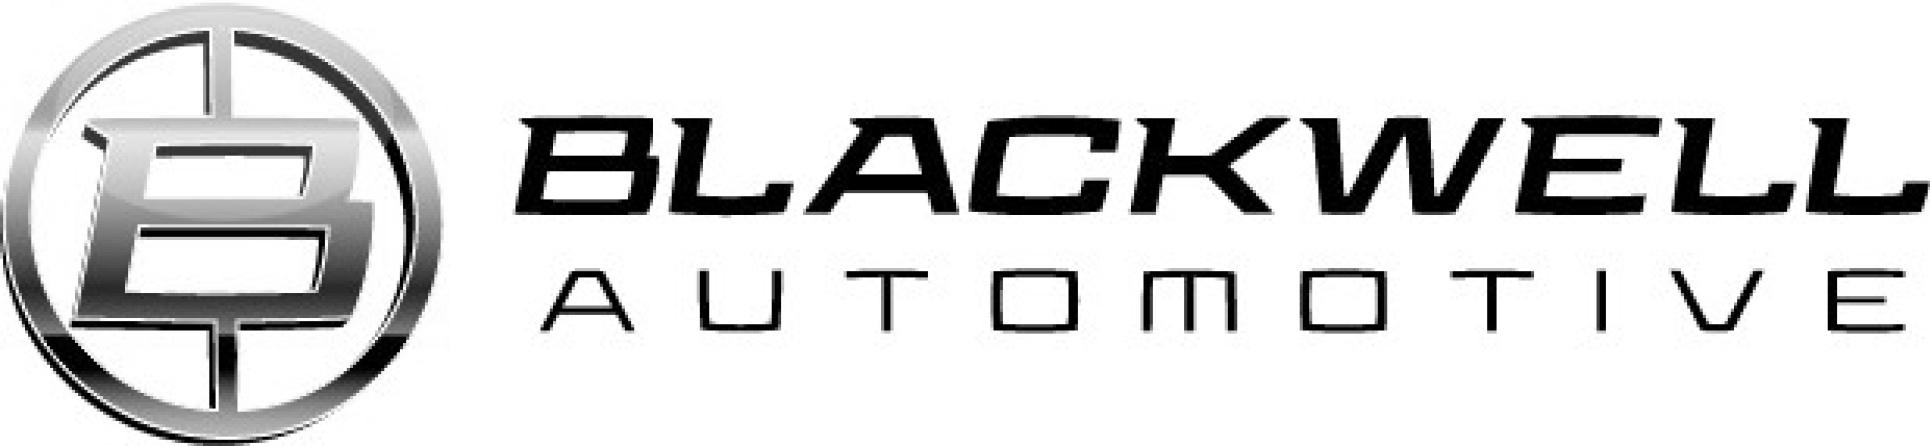 Blackwell Automotive